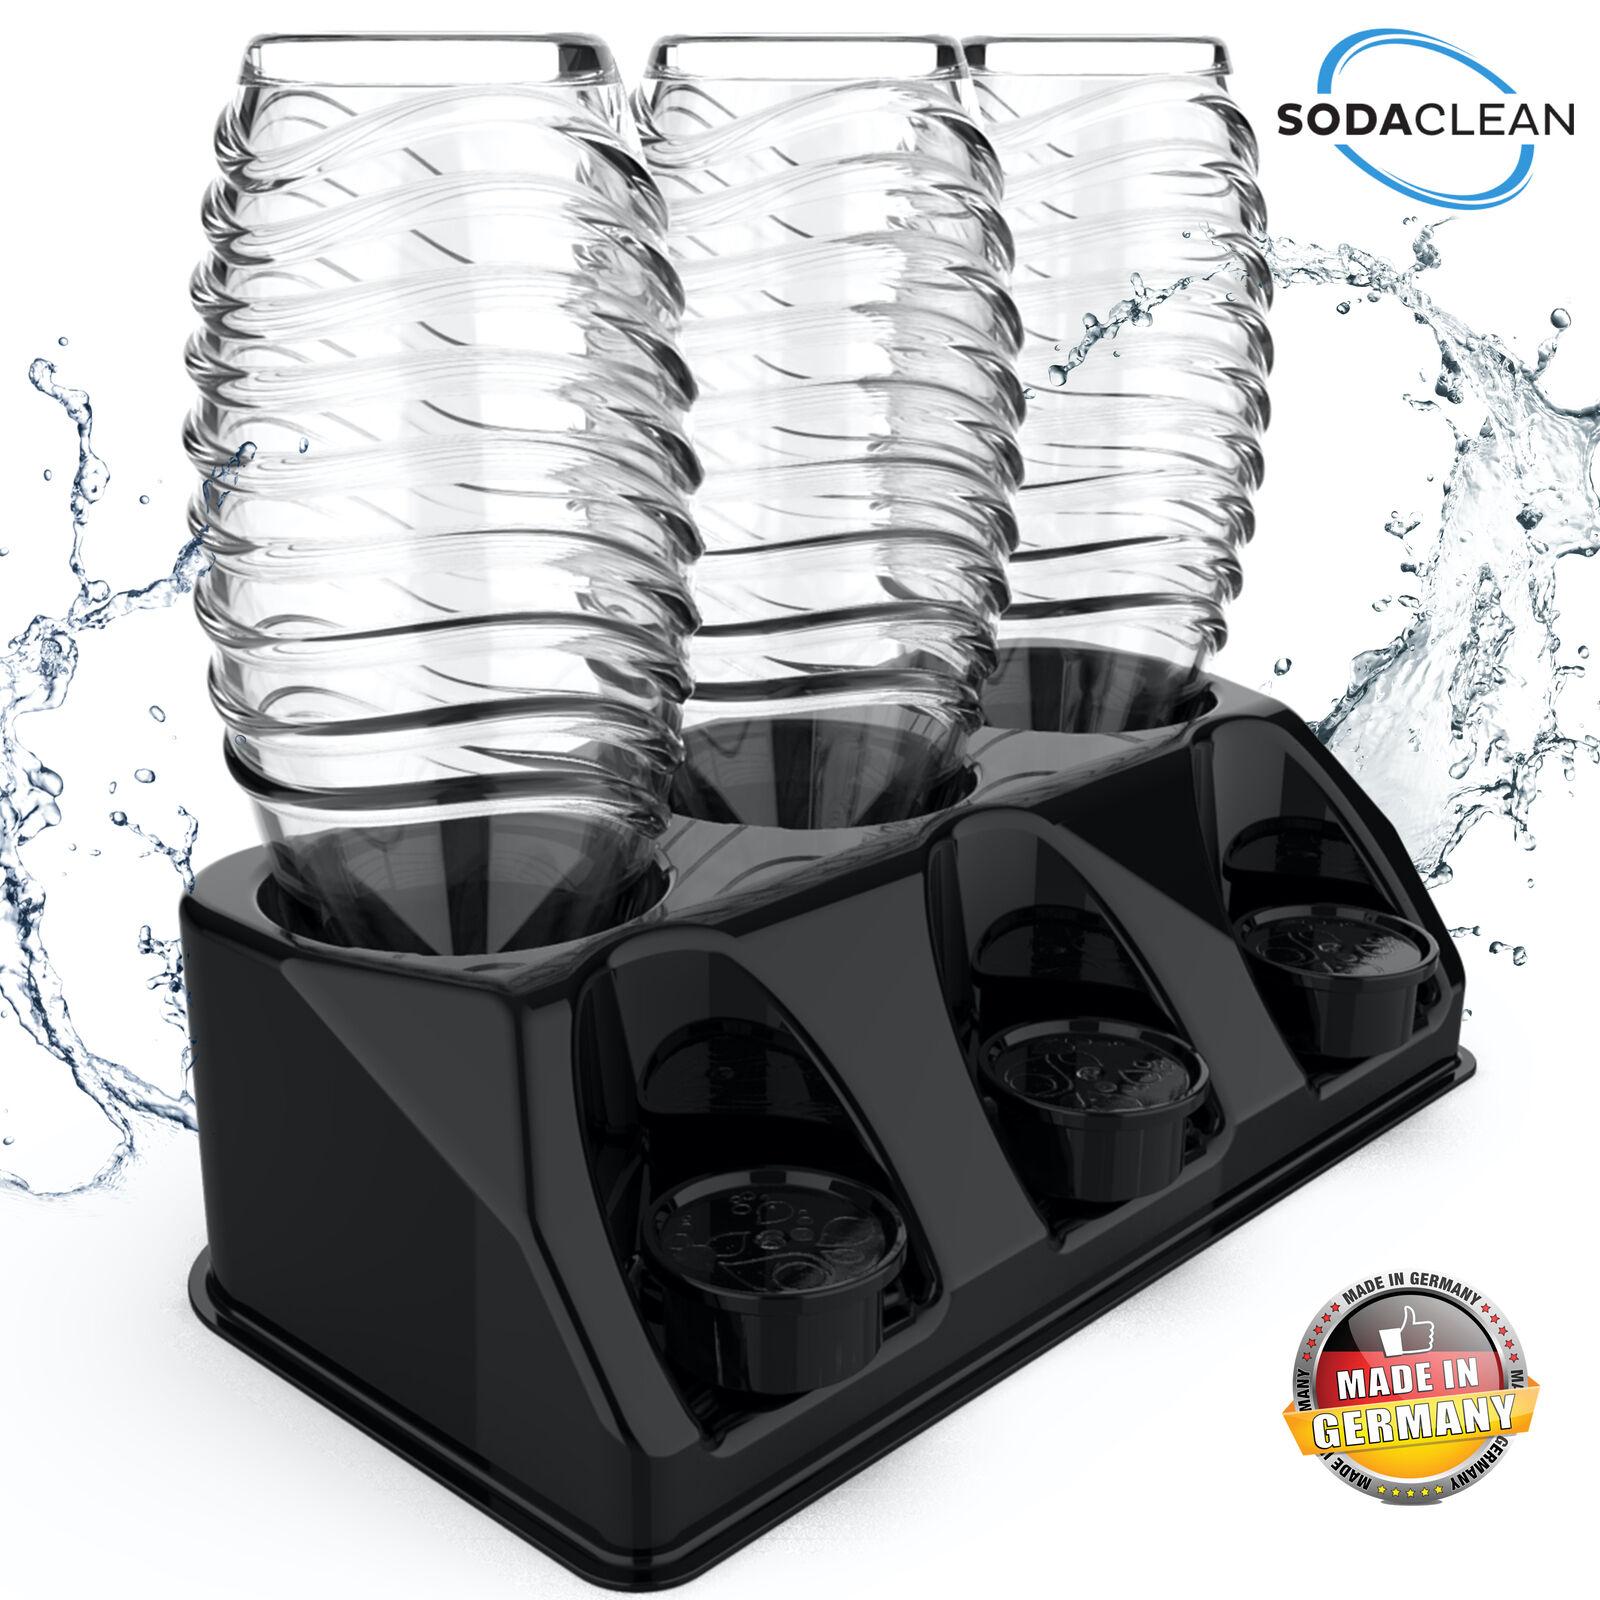 SodaClean® Flaschenhalter Abtropfhalter Sodastream Crystal DUO Aarke Easy Power